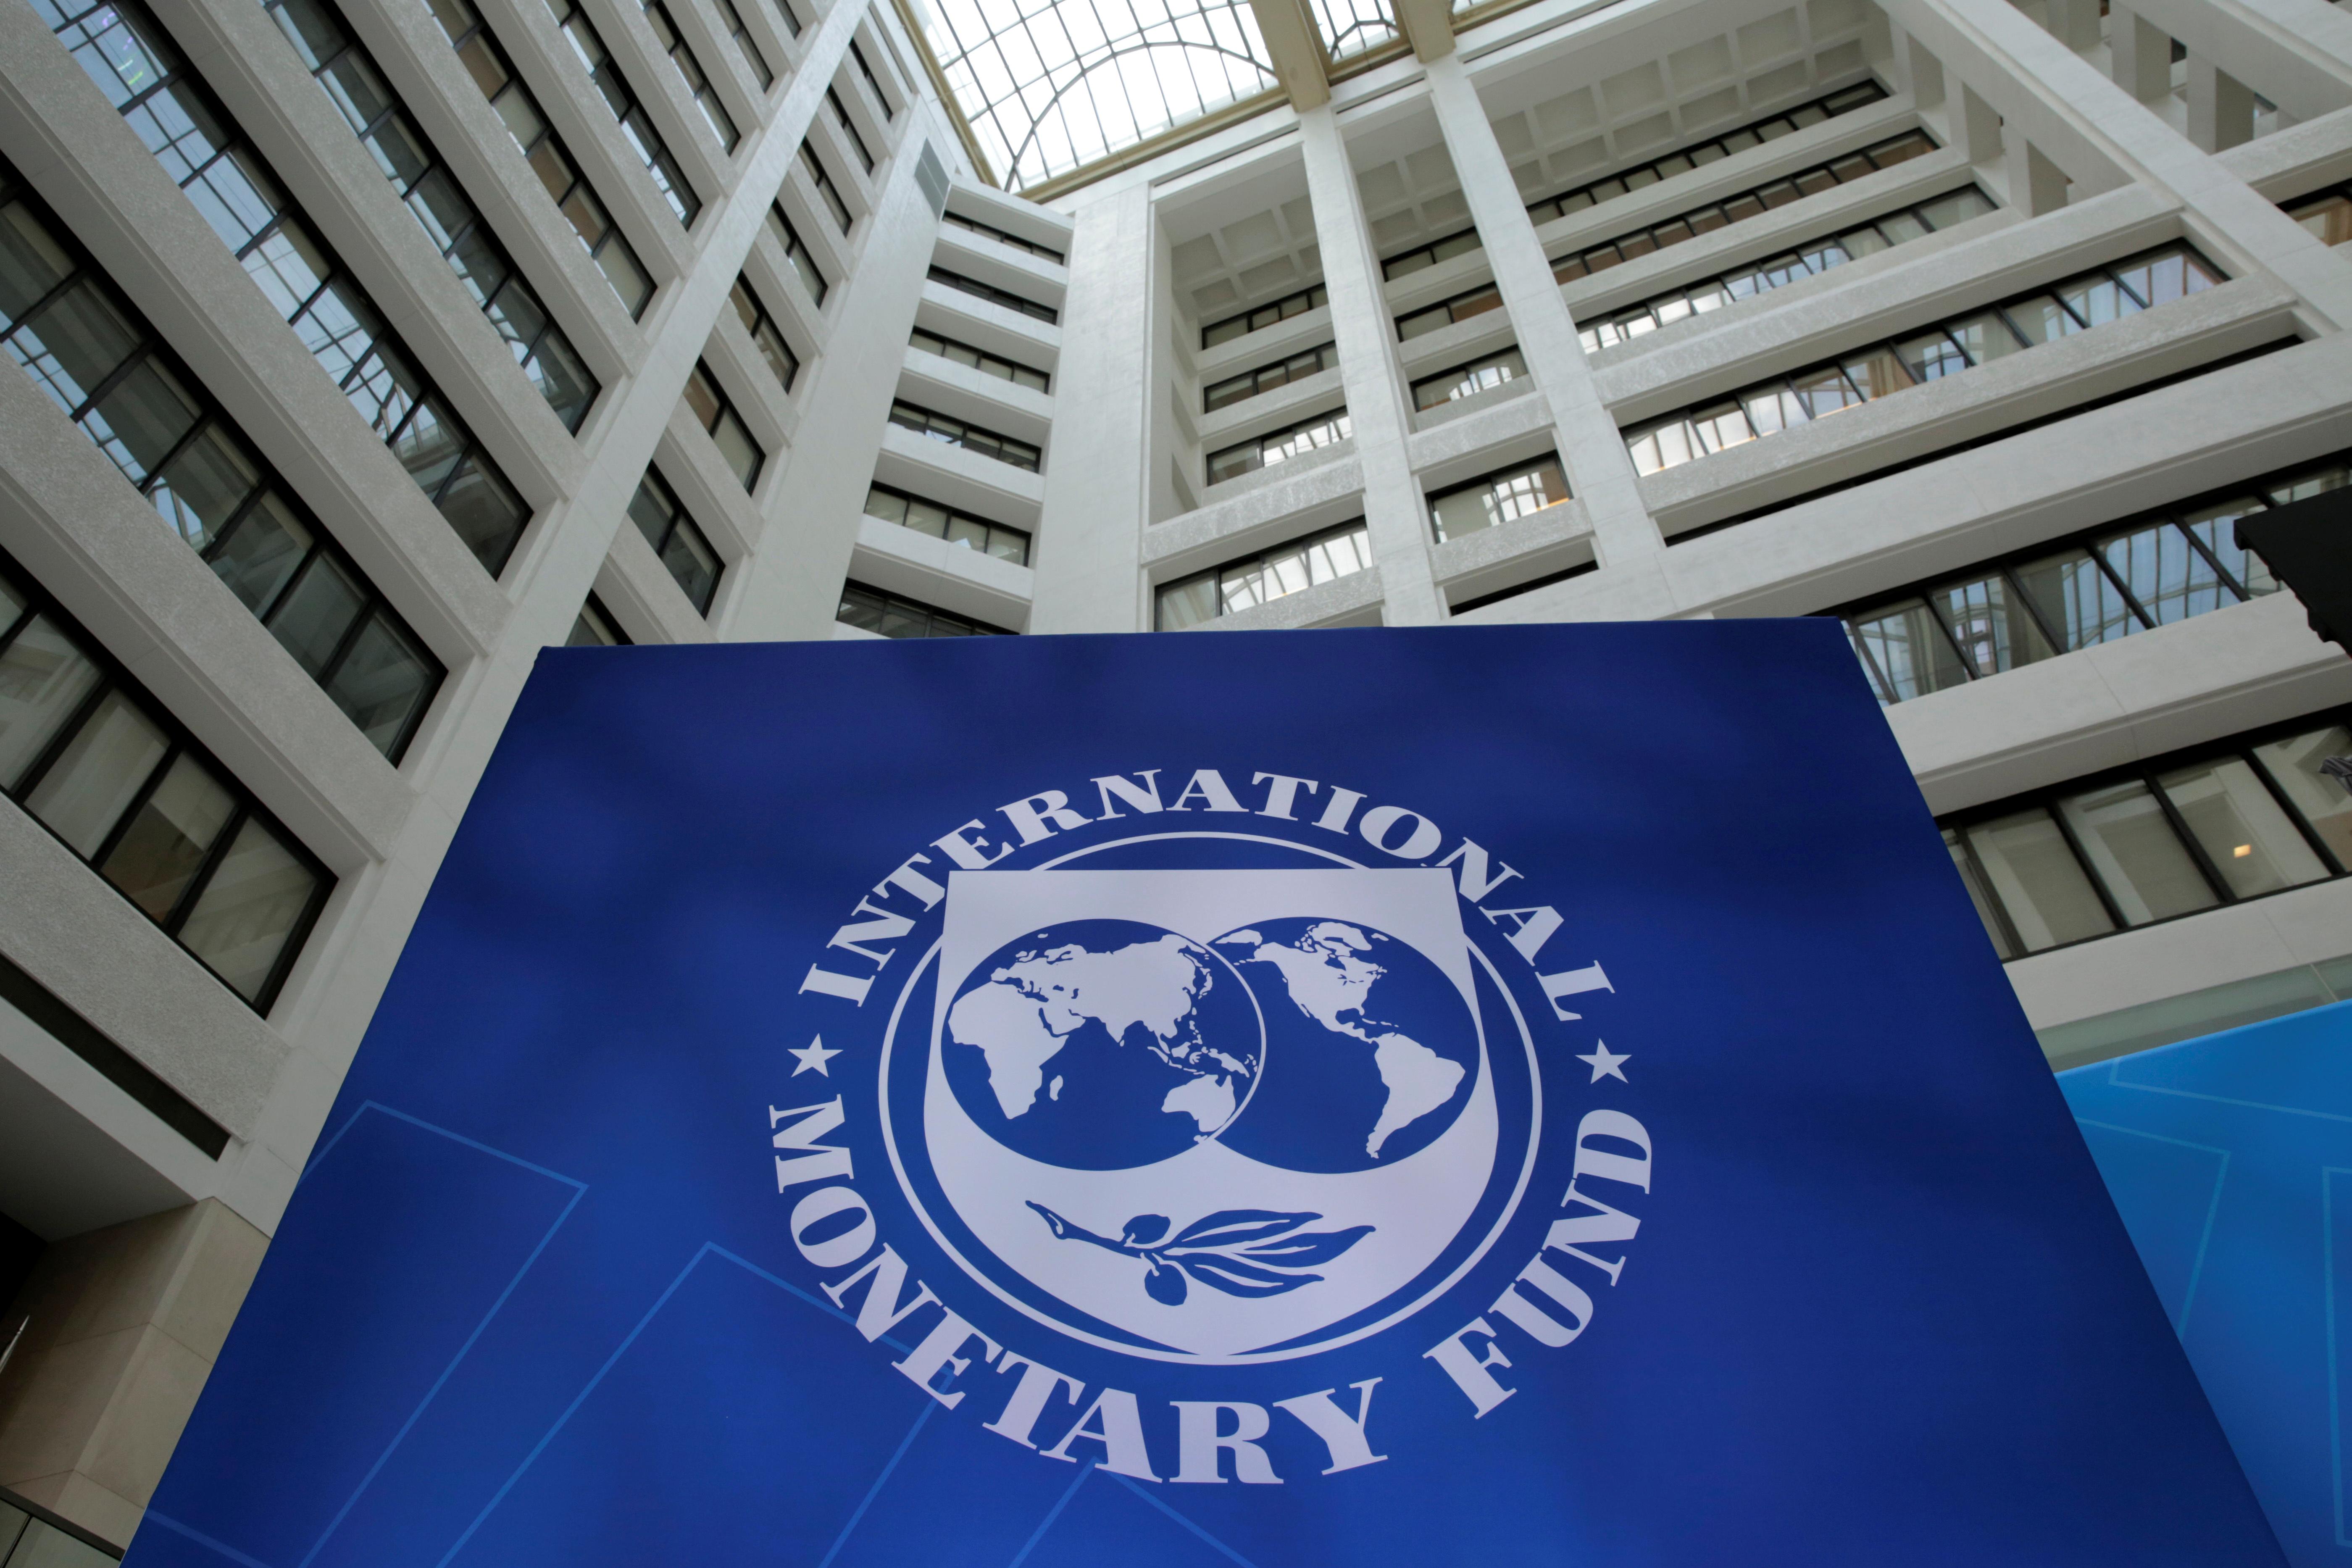 The IMF logo is pictured in Washington, U.S., April 21, 2017. REUTERS/Yuri Gripas